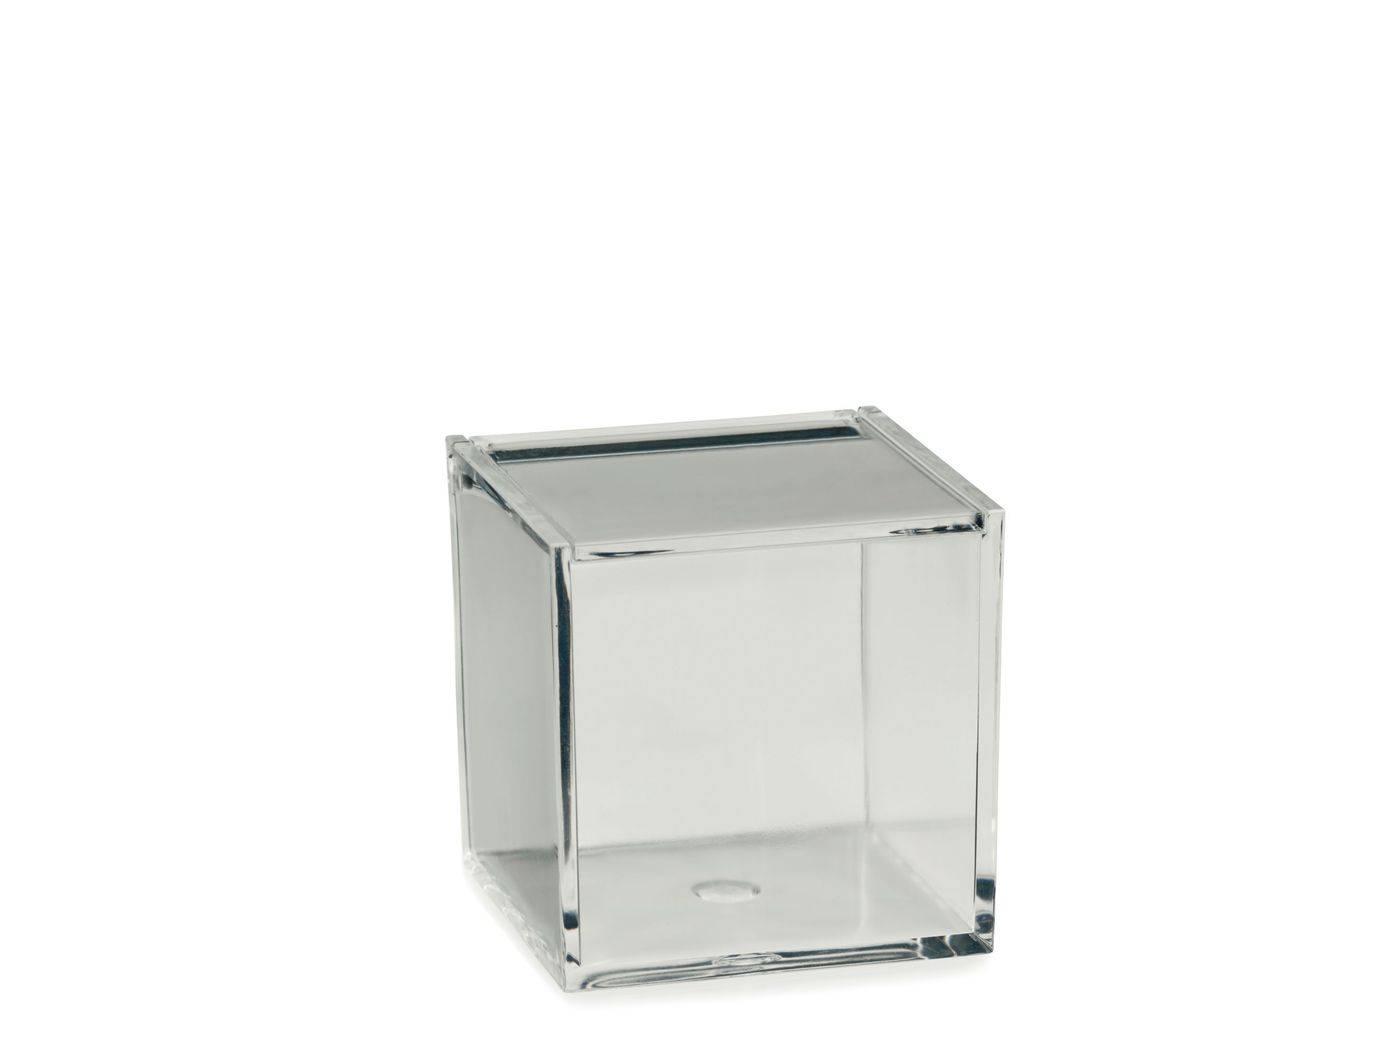 Kosmetická dóza SAFIRA plast, transparent, 8x8x8cm - Kela